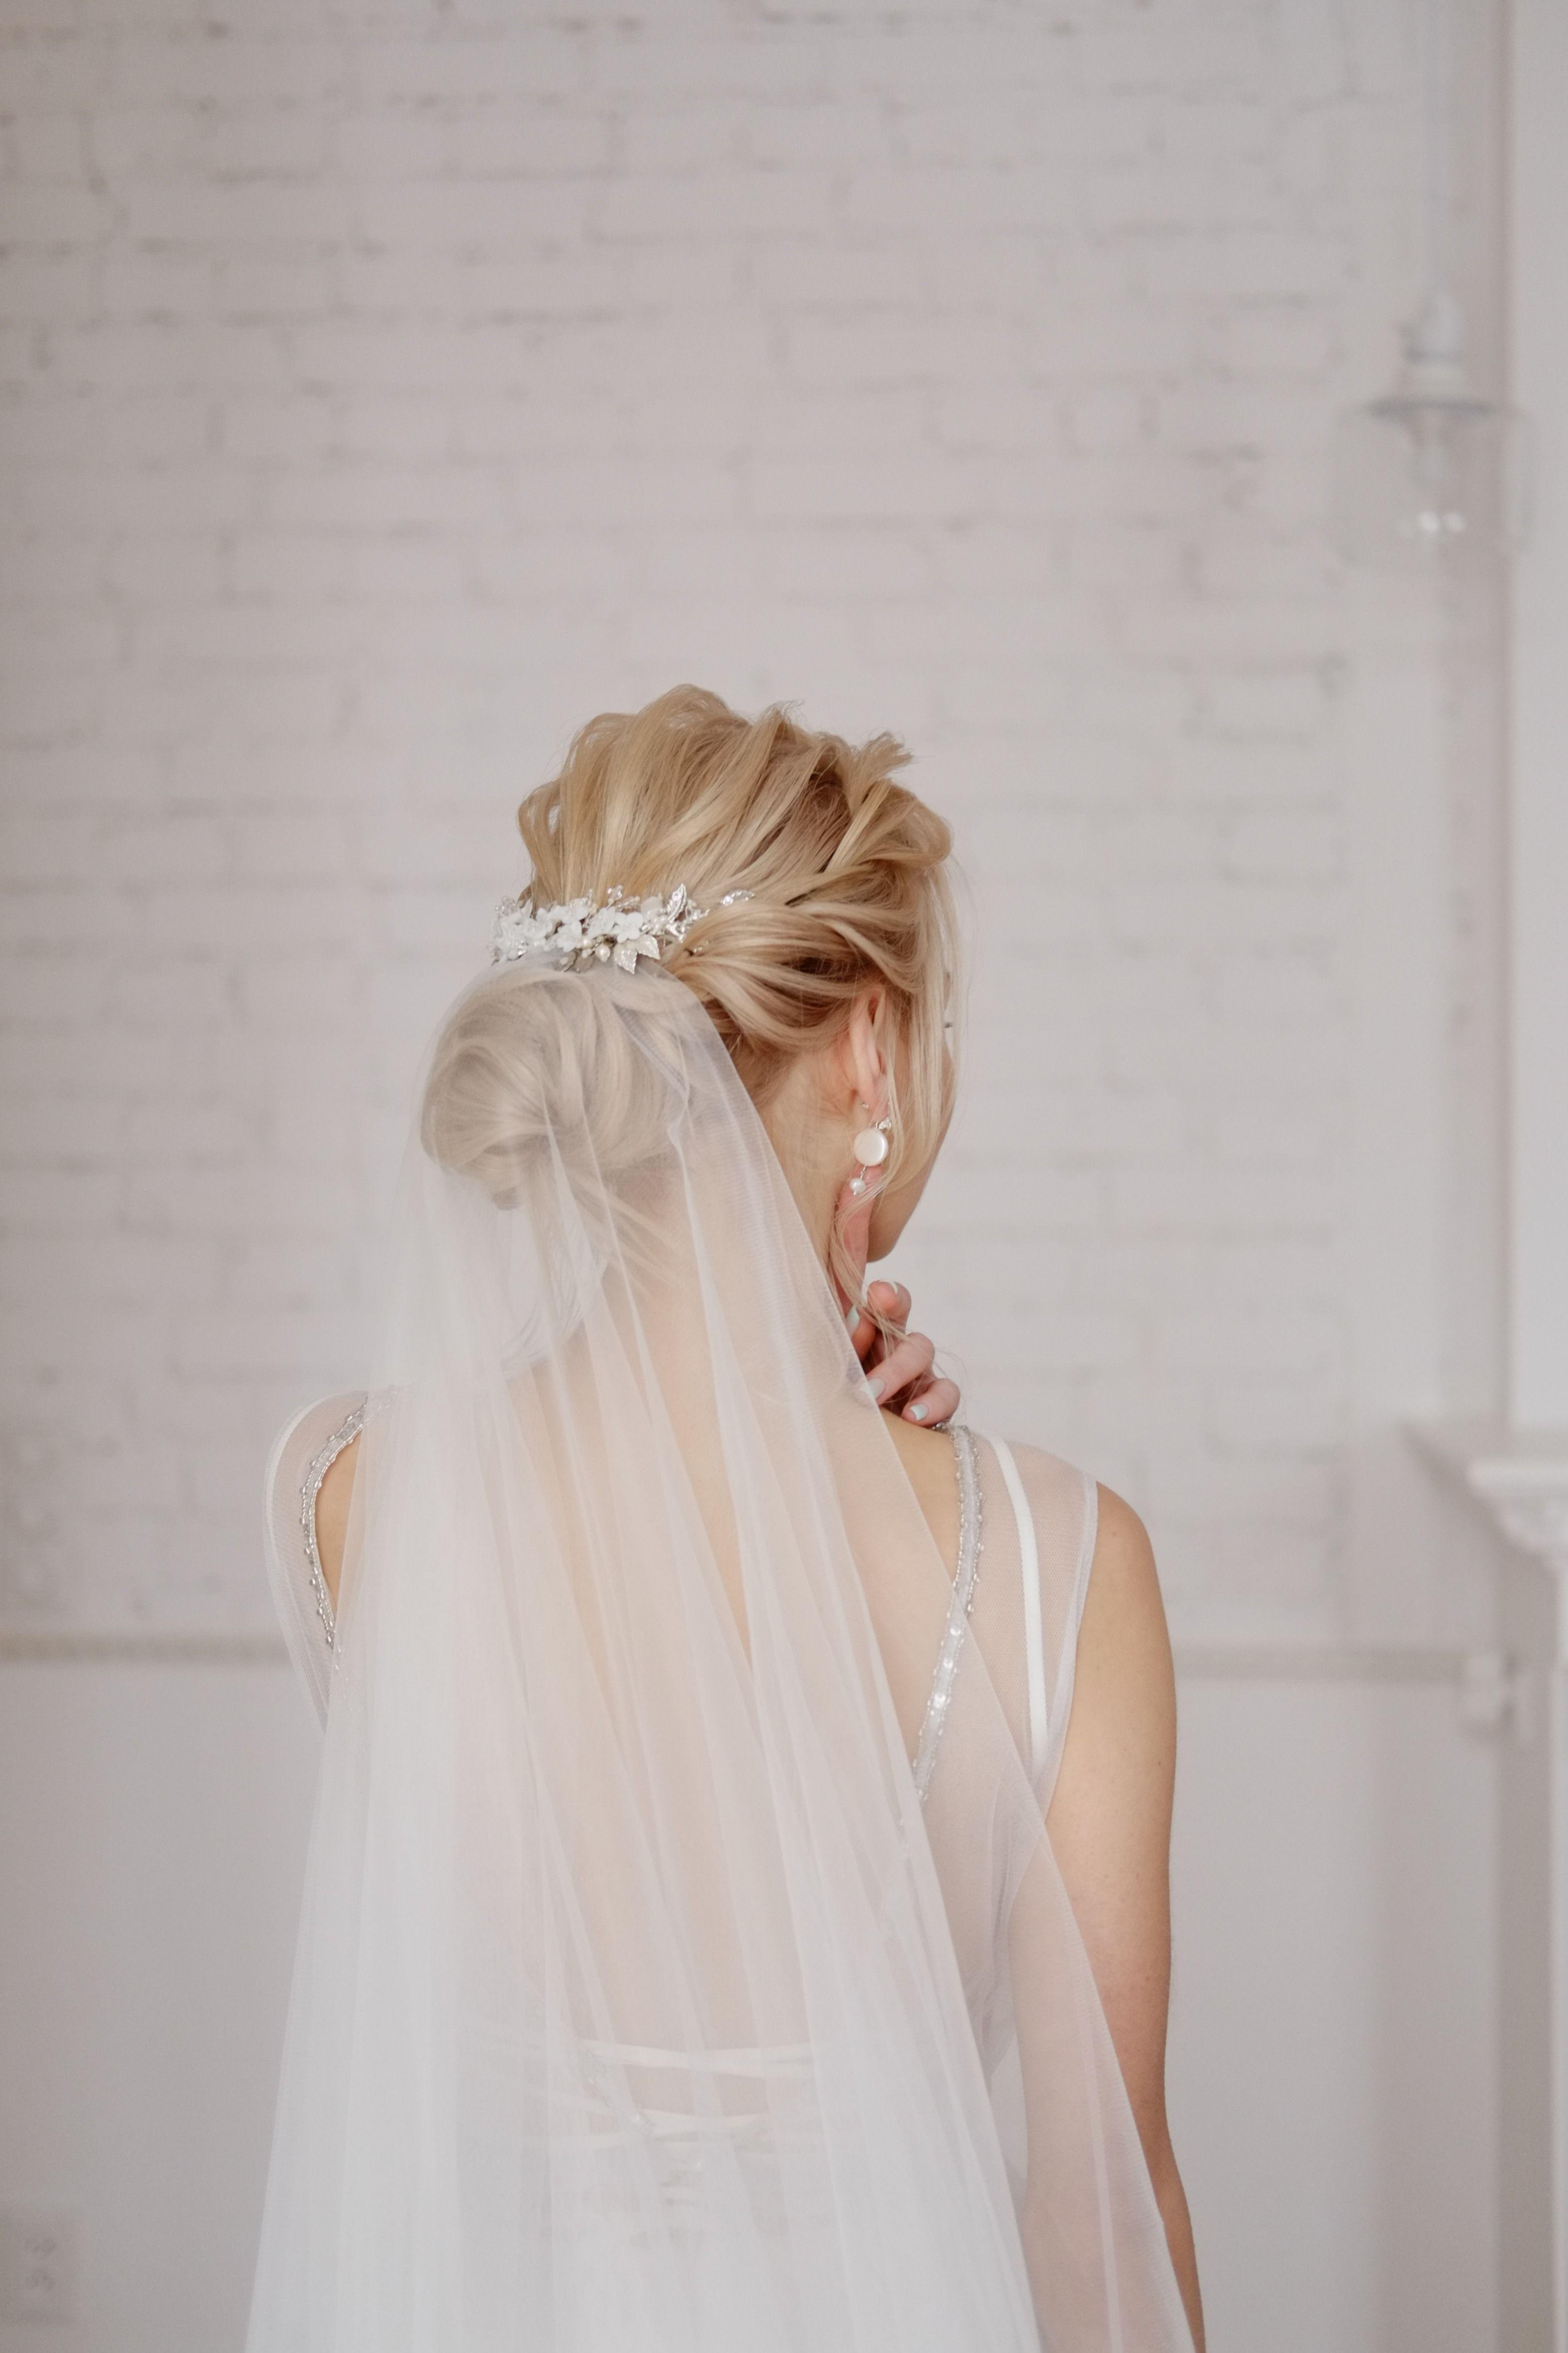 Flower Hair Comb Bridal Hair Comb Wedding Hair Comb Hair Comb Hair Accessories Wedding Hair Pi Wedding Hairstyles With Veil Classic Wedding Hair Hairdo Wedding